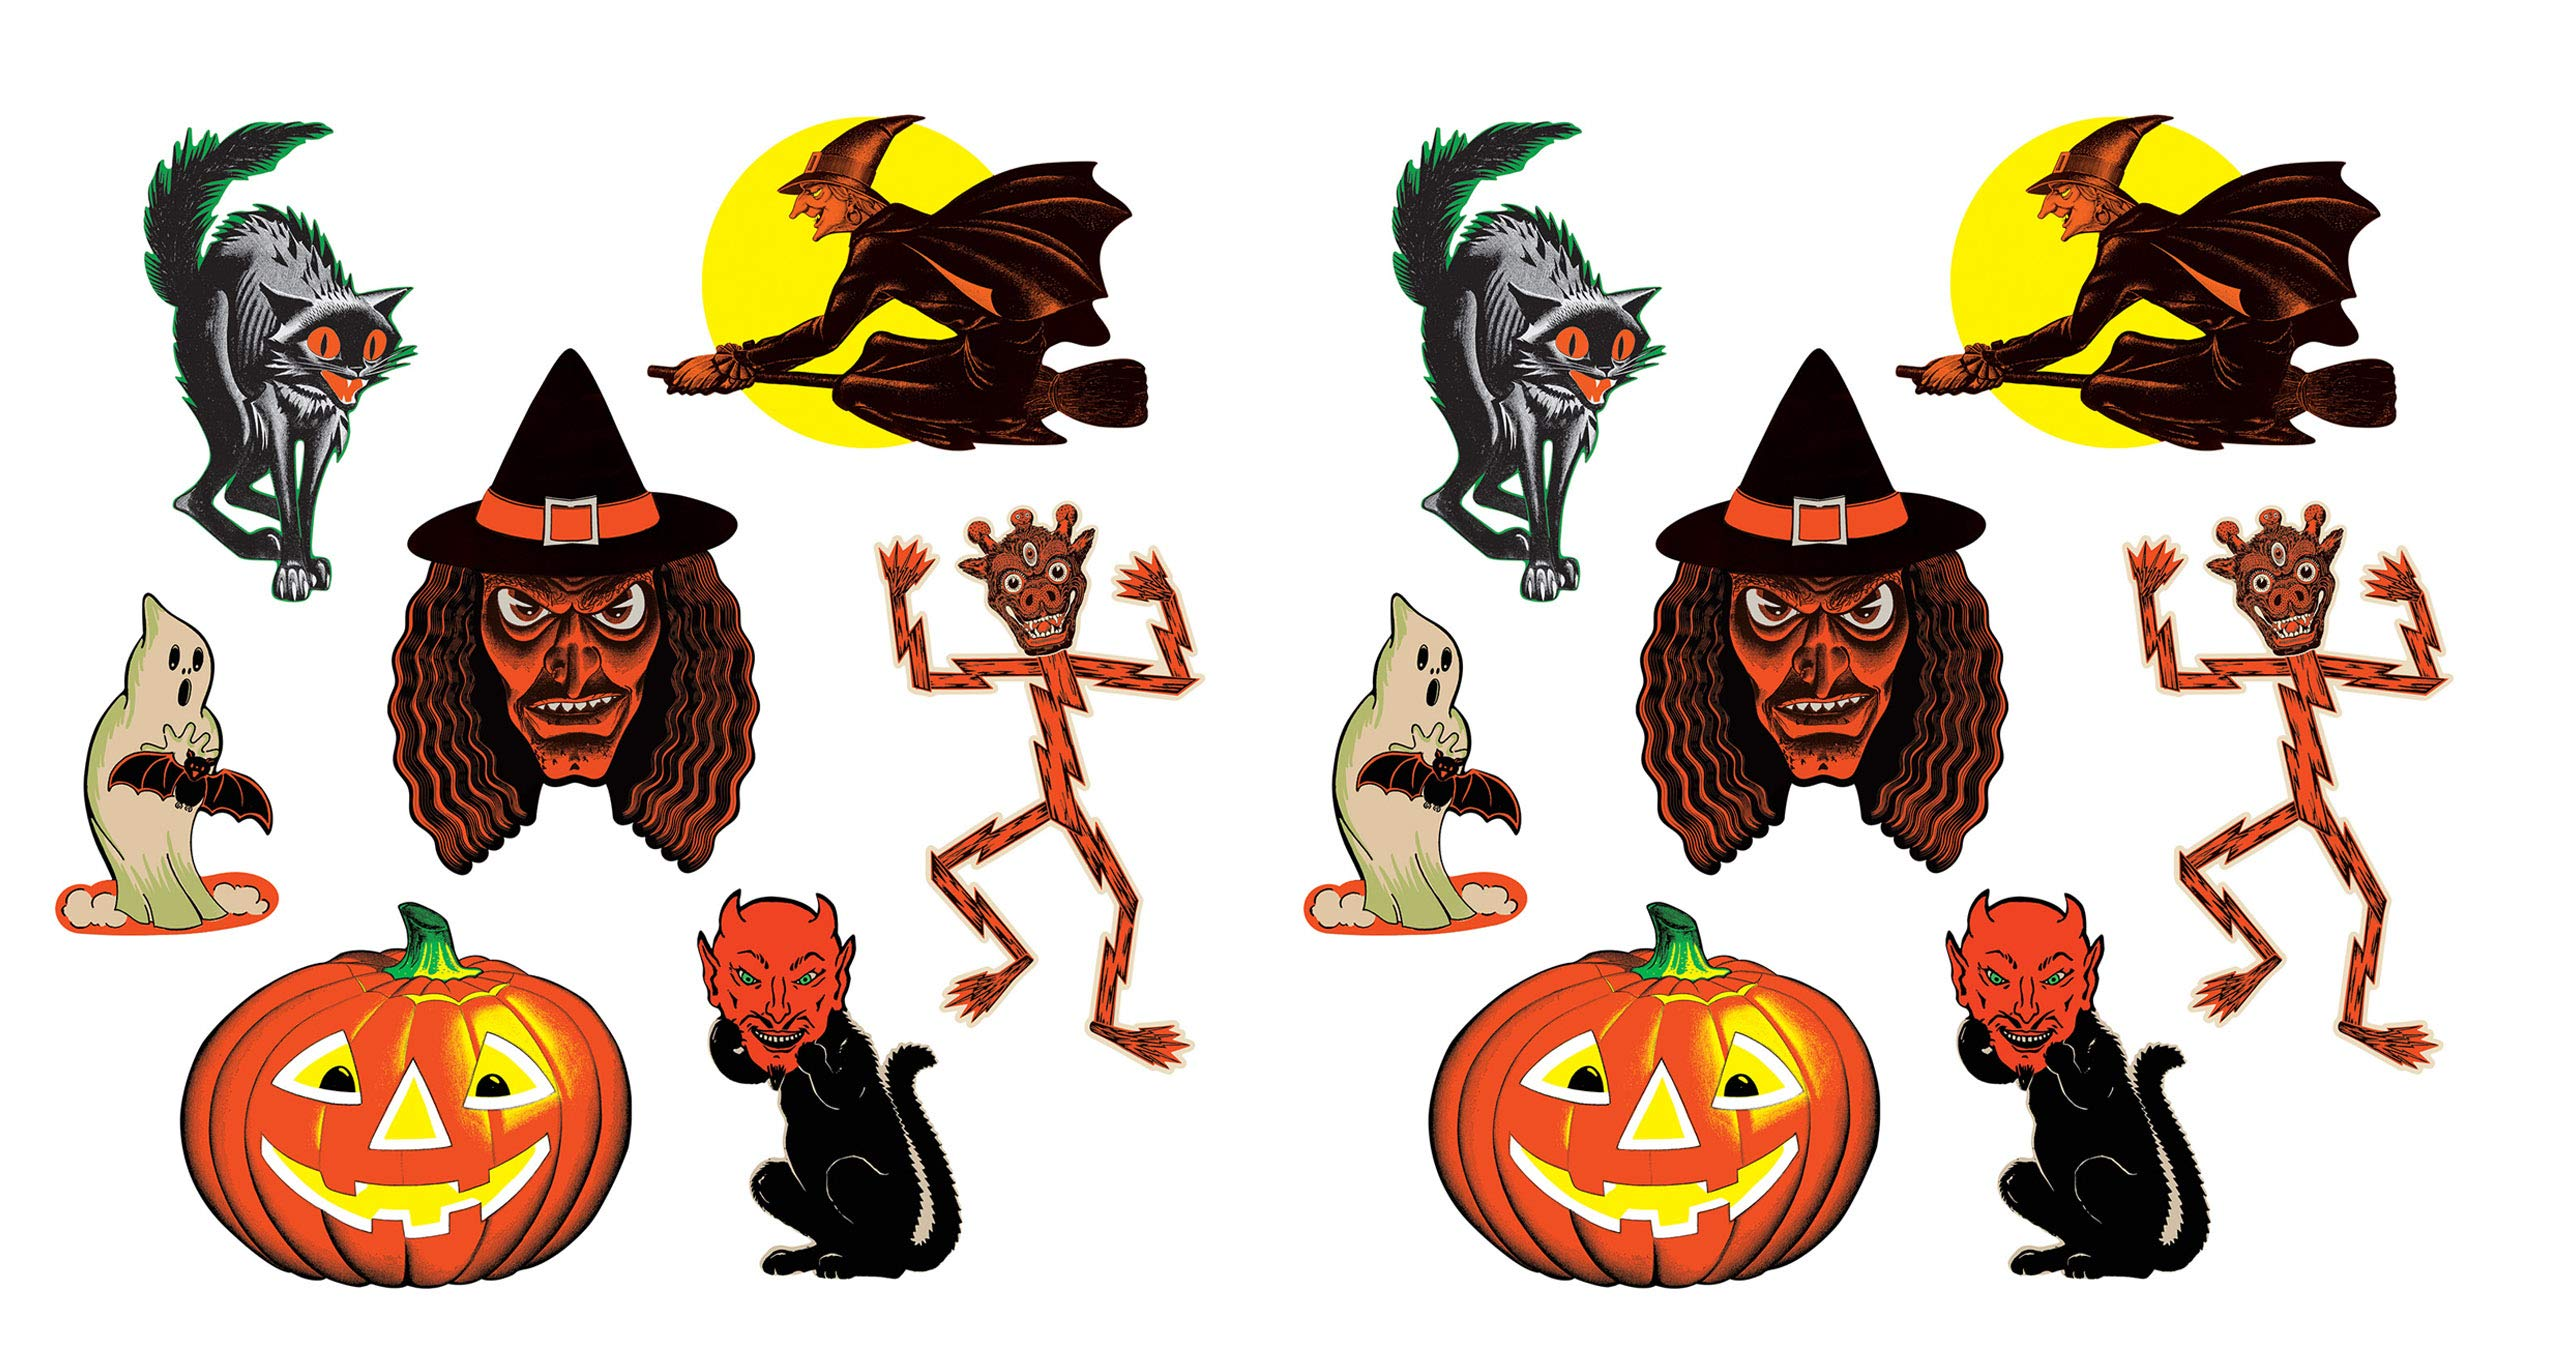 Beistle 00429 Vintage Halloween Classic Cutouts 14 Piece, 9.5'' - 16'', Multicolored